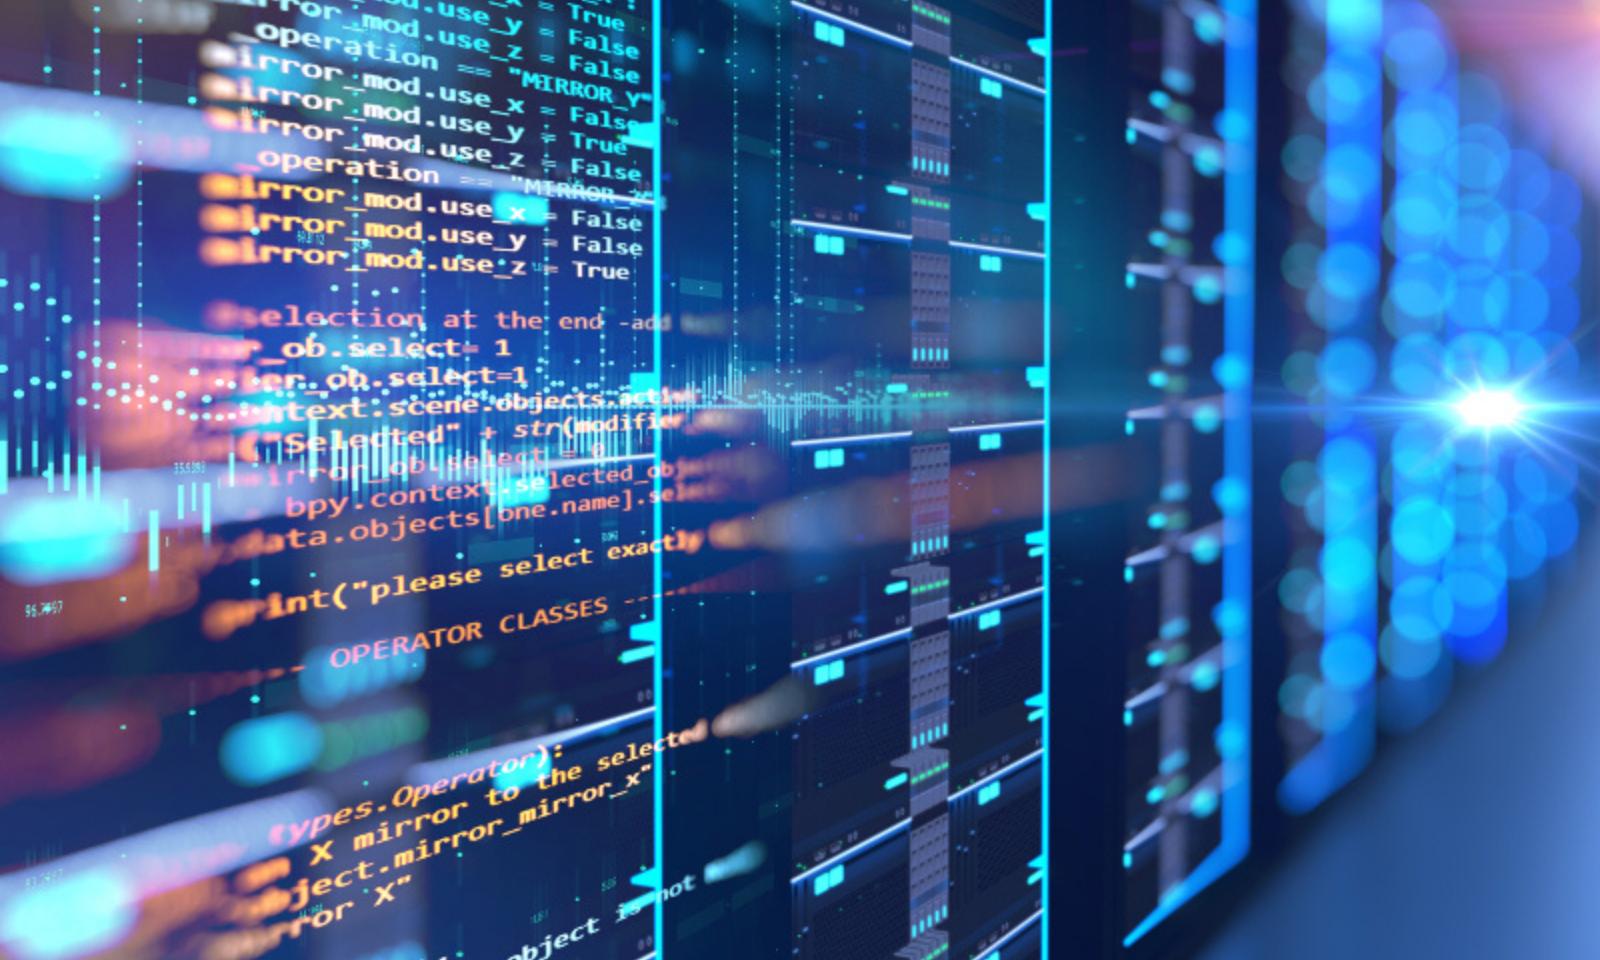 Zero Trust: SecureCircle plus Endpoint Detection and Response